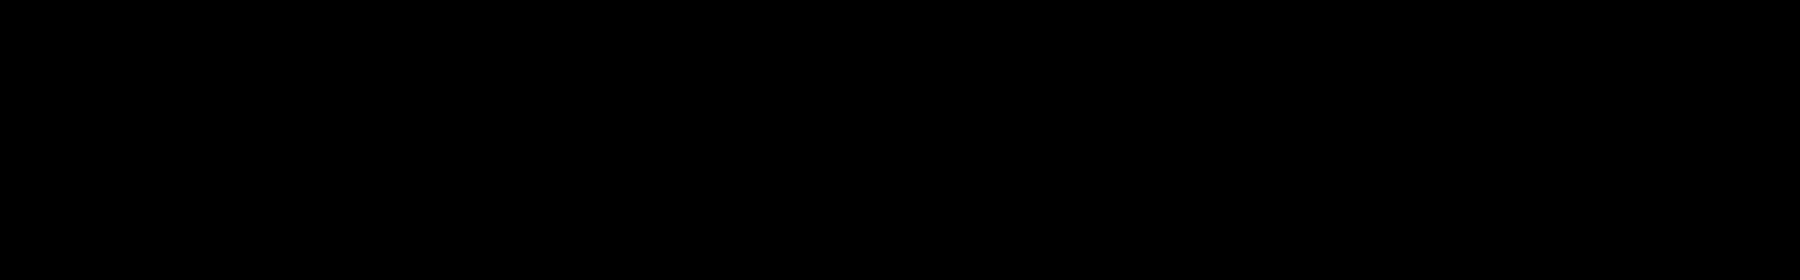 Stardust audio waveform